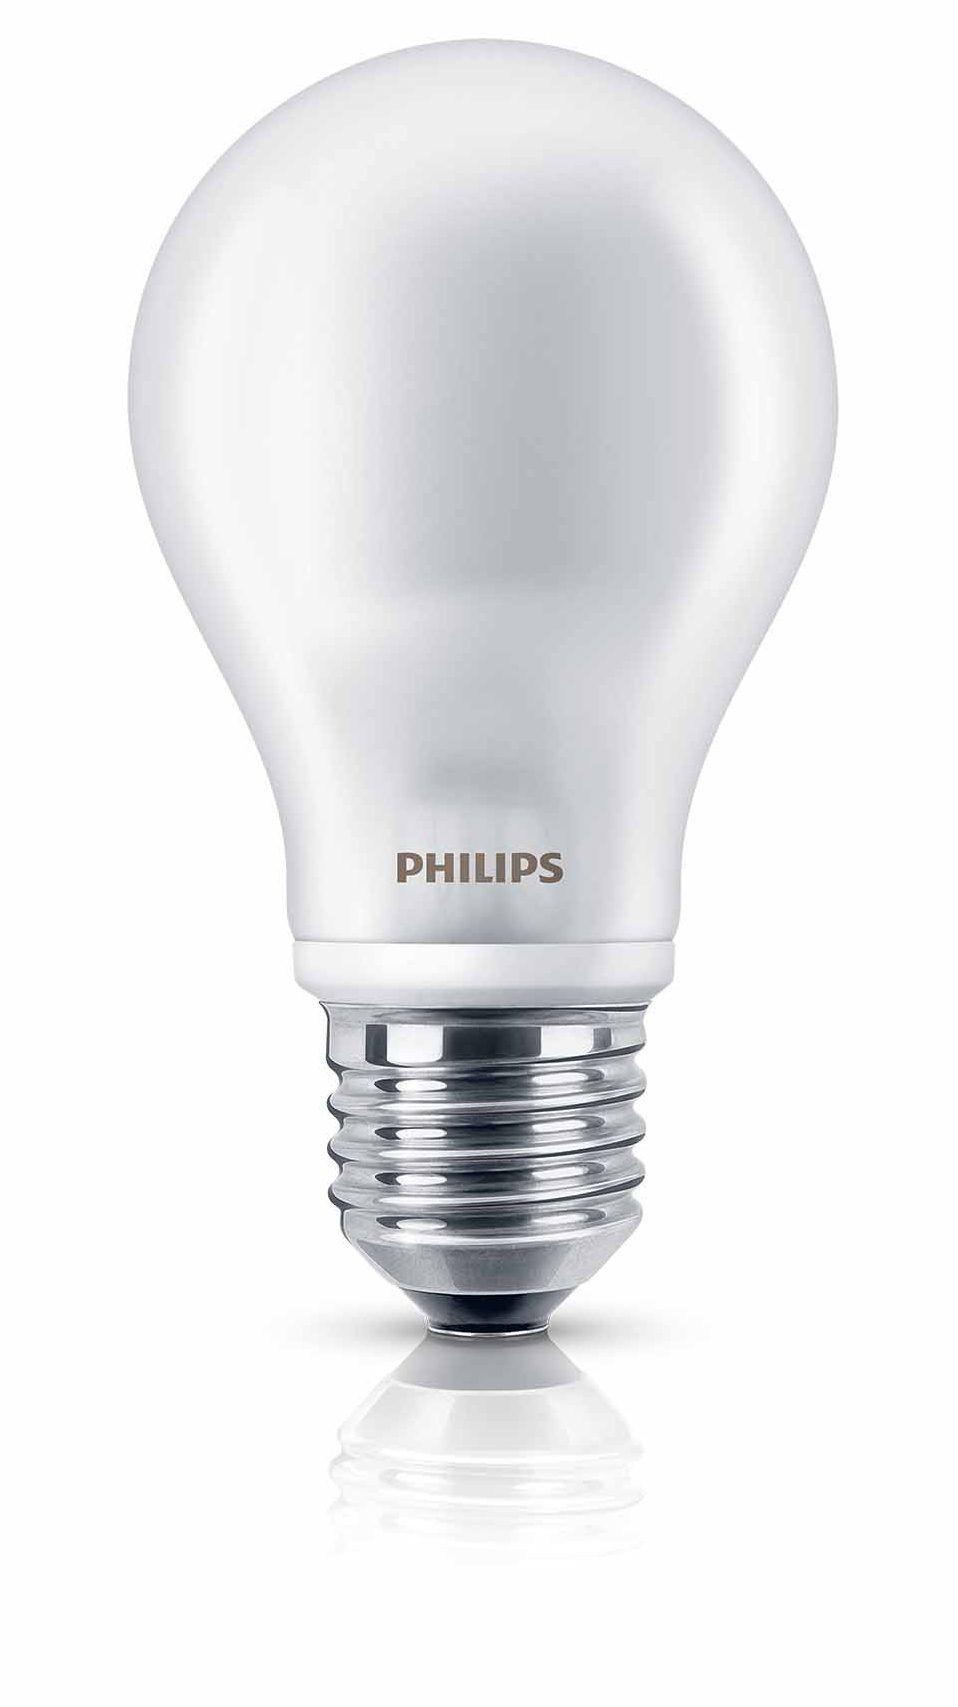 Korting Philips LED lamp E27 6W 470Lm classic mat 2 stuks